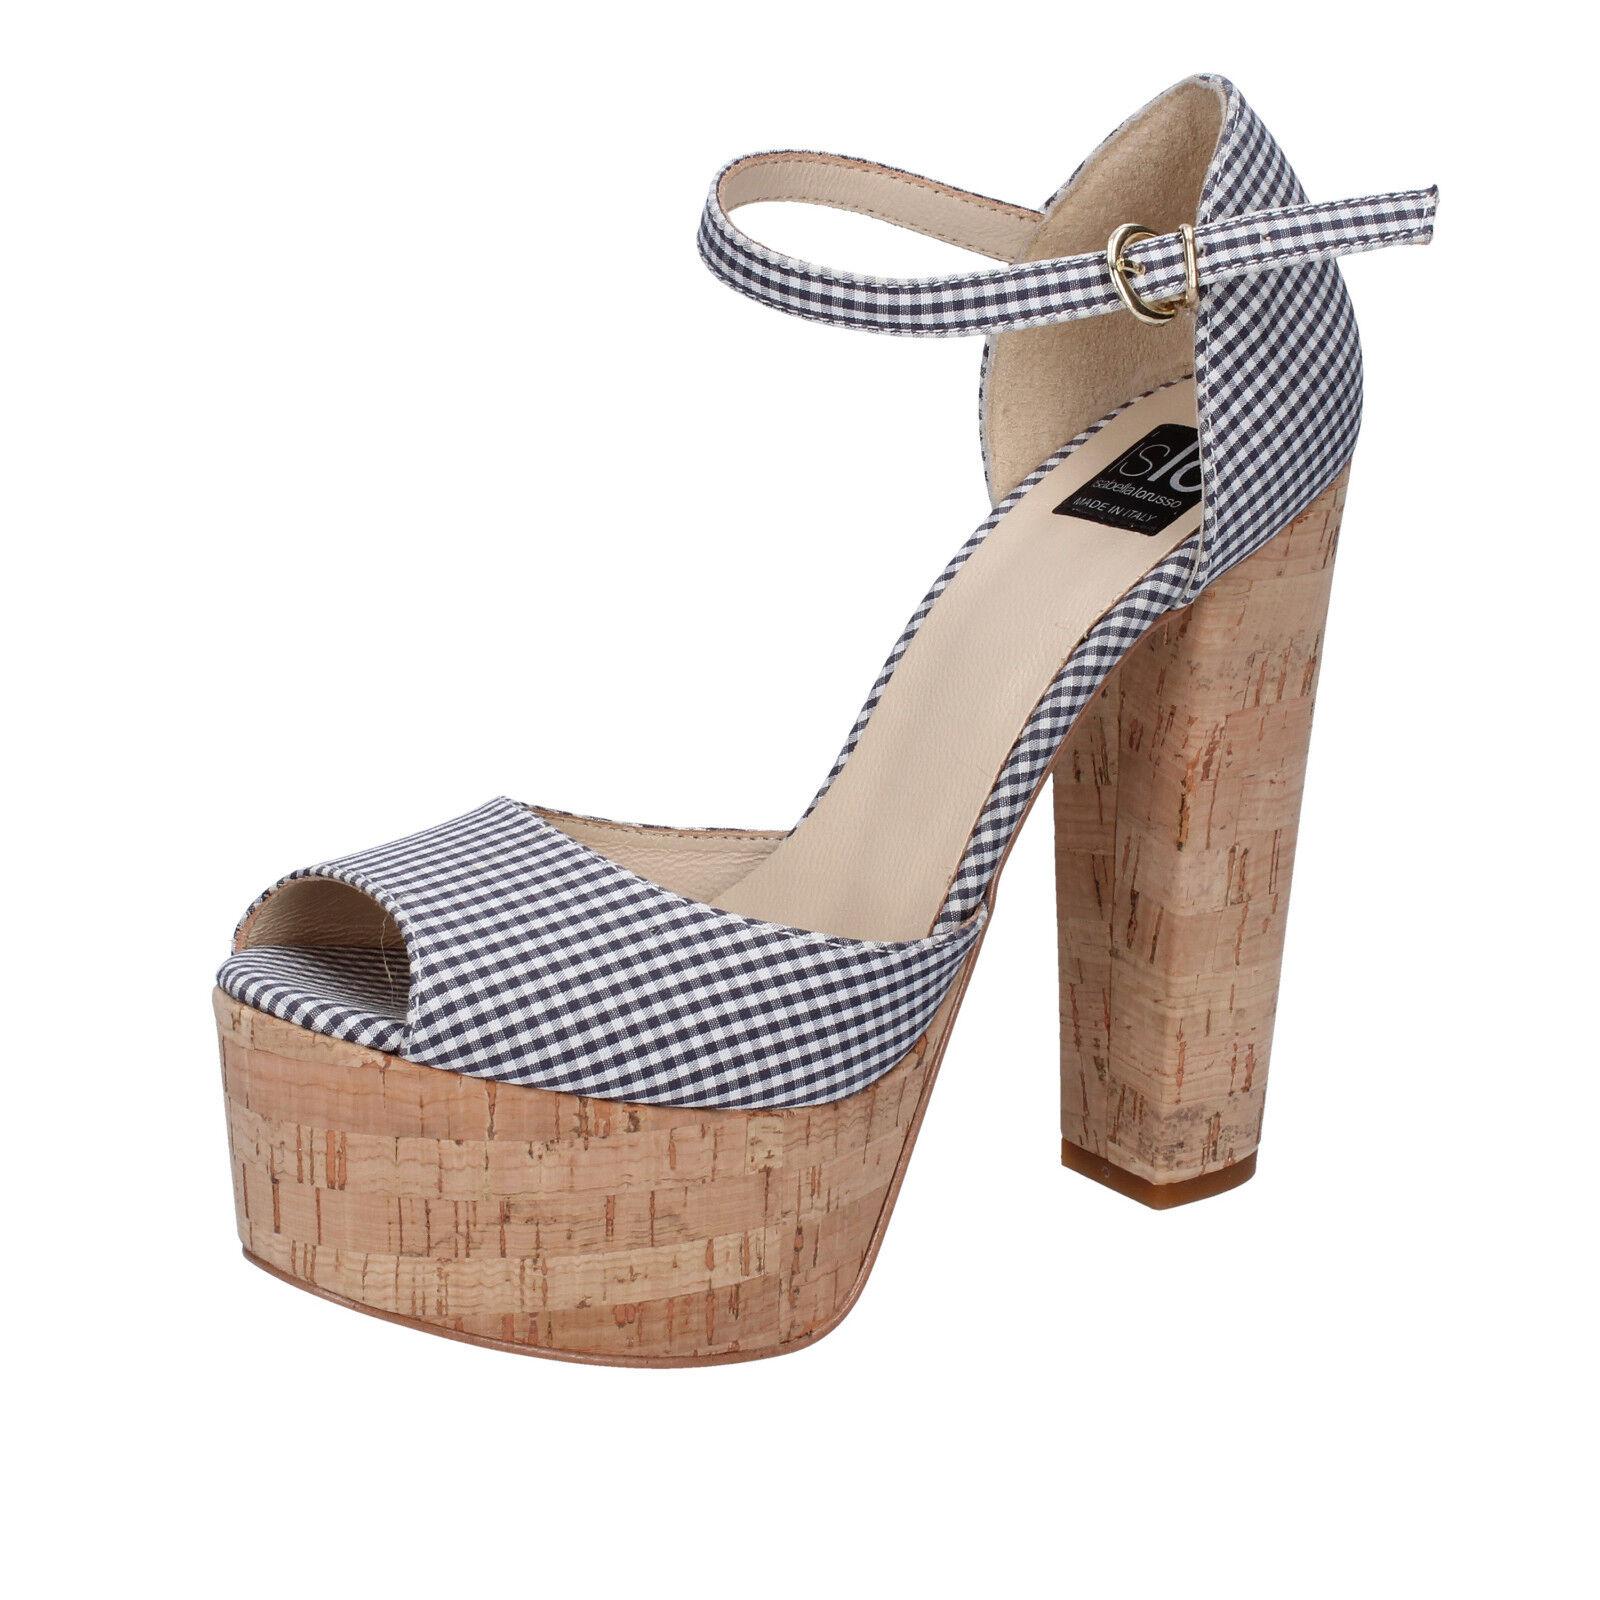 Scarpe donna ISLO ISABELLA LORUSSO 37 EU sandali nero bianco tessuto BZ223-C